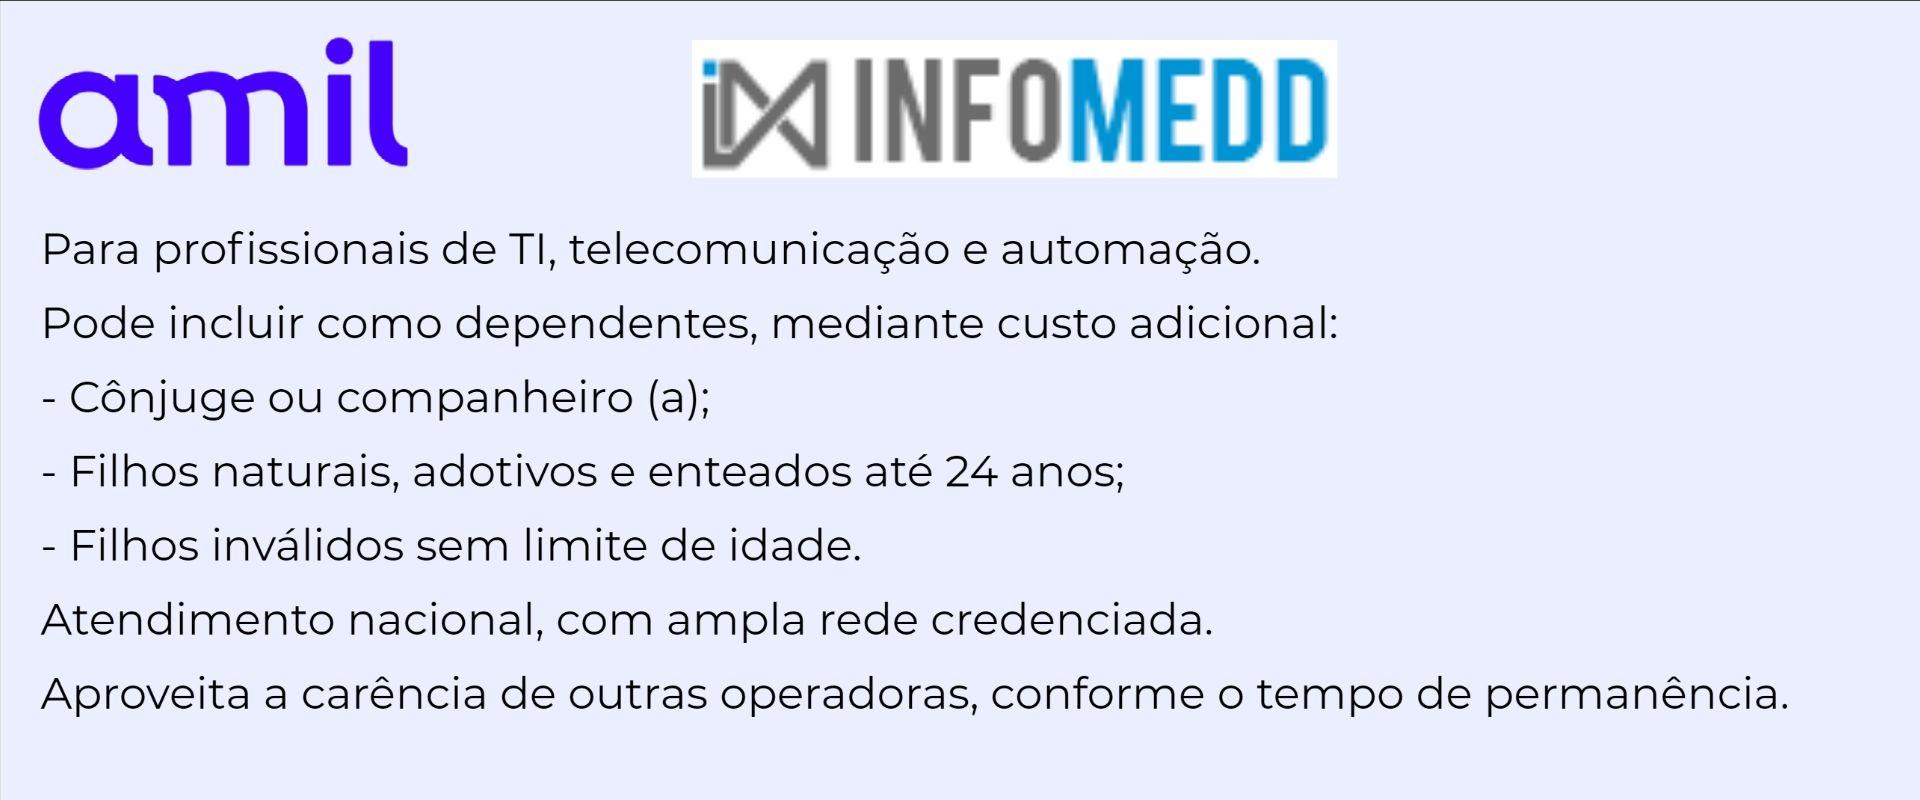 Amil Infomedd-RJ